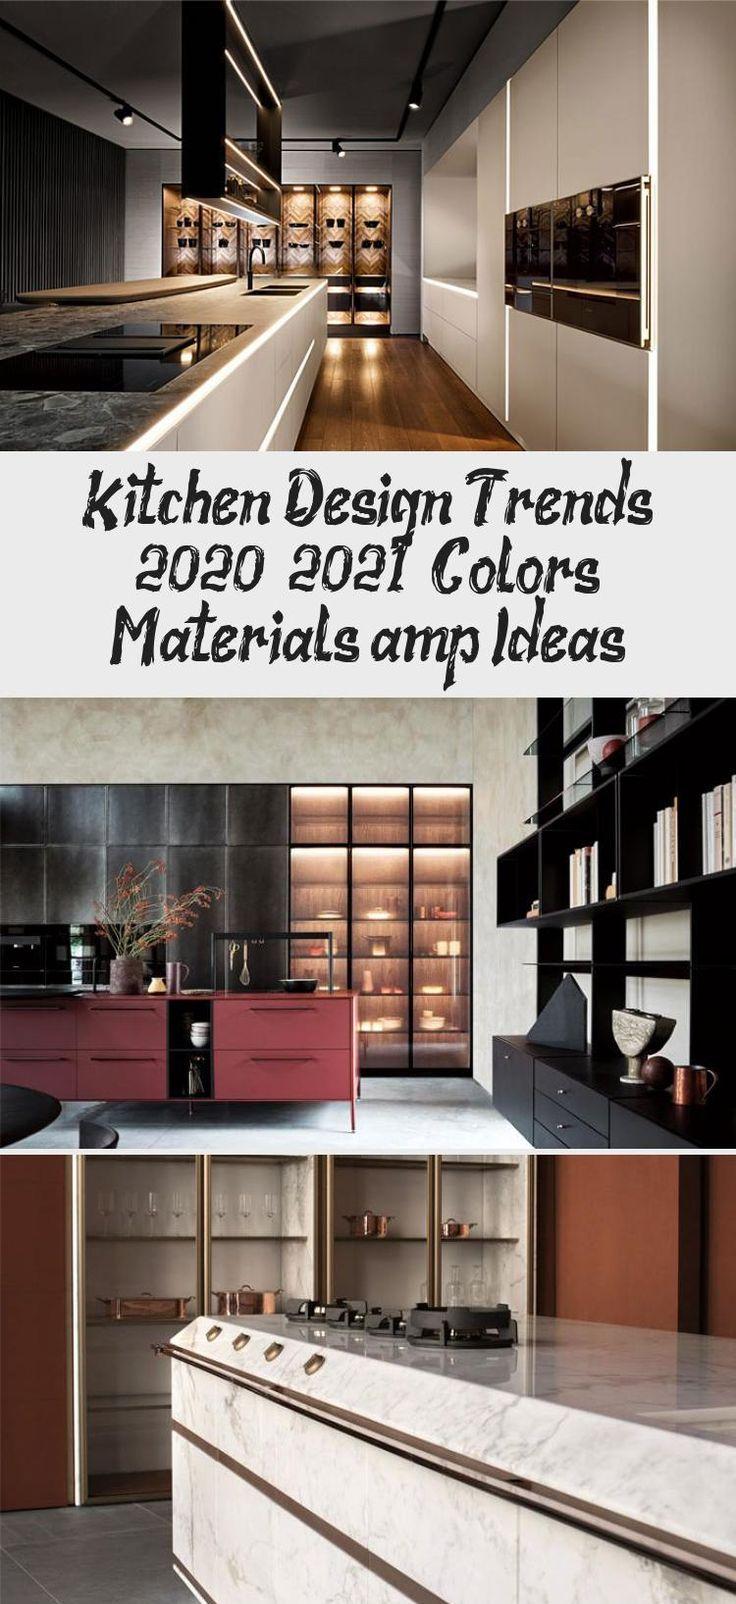 kitchen design trends 2020 2021 colors materials ideas kitchen decor in 2020 on kitchen decor trends id=86421